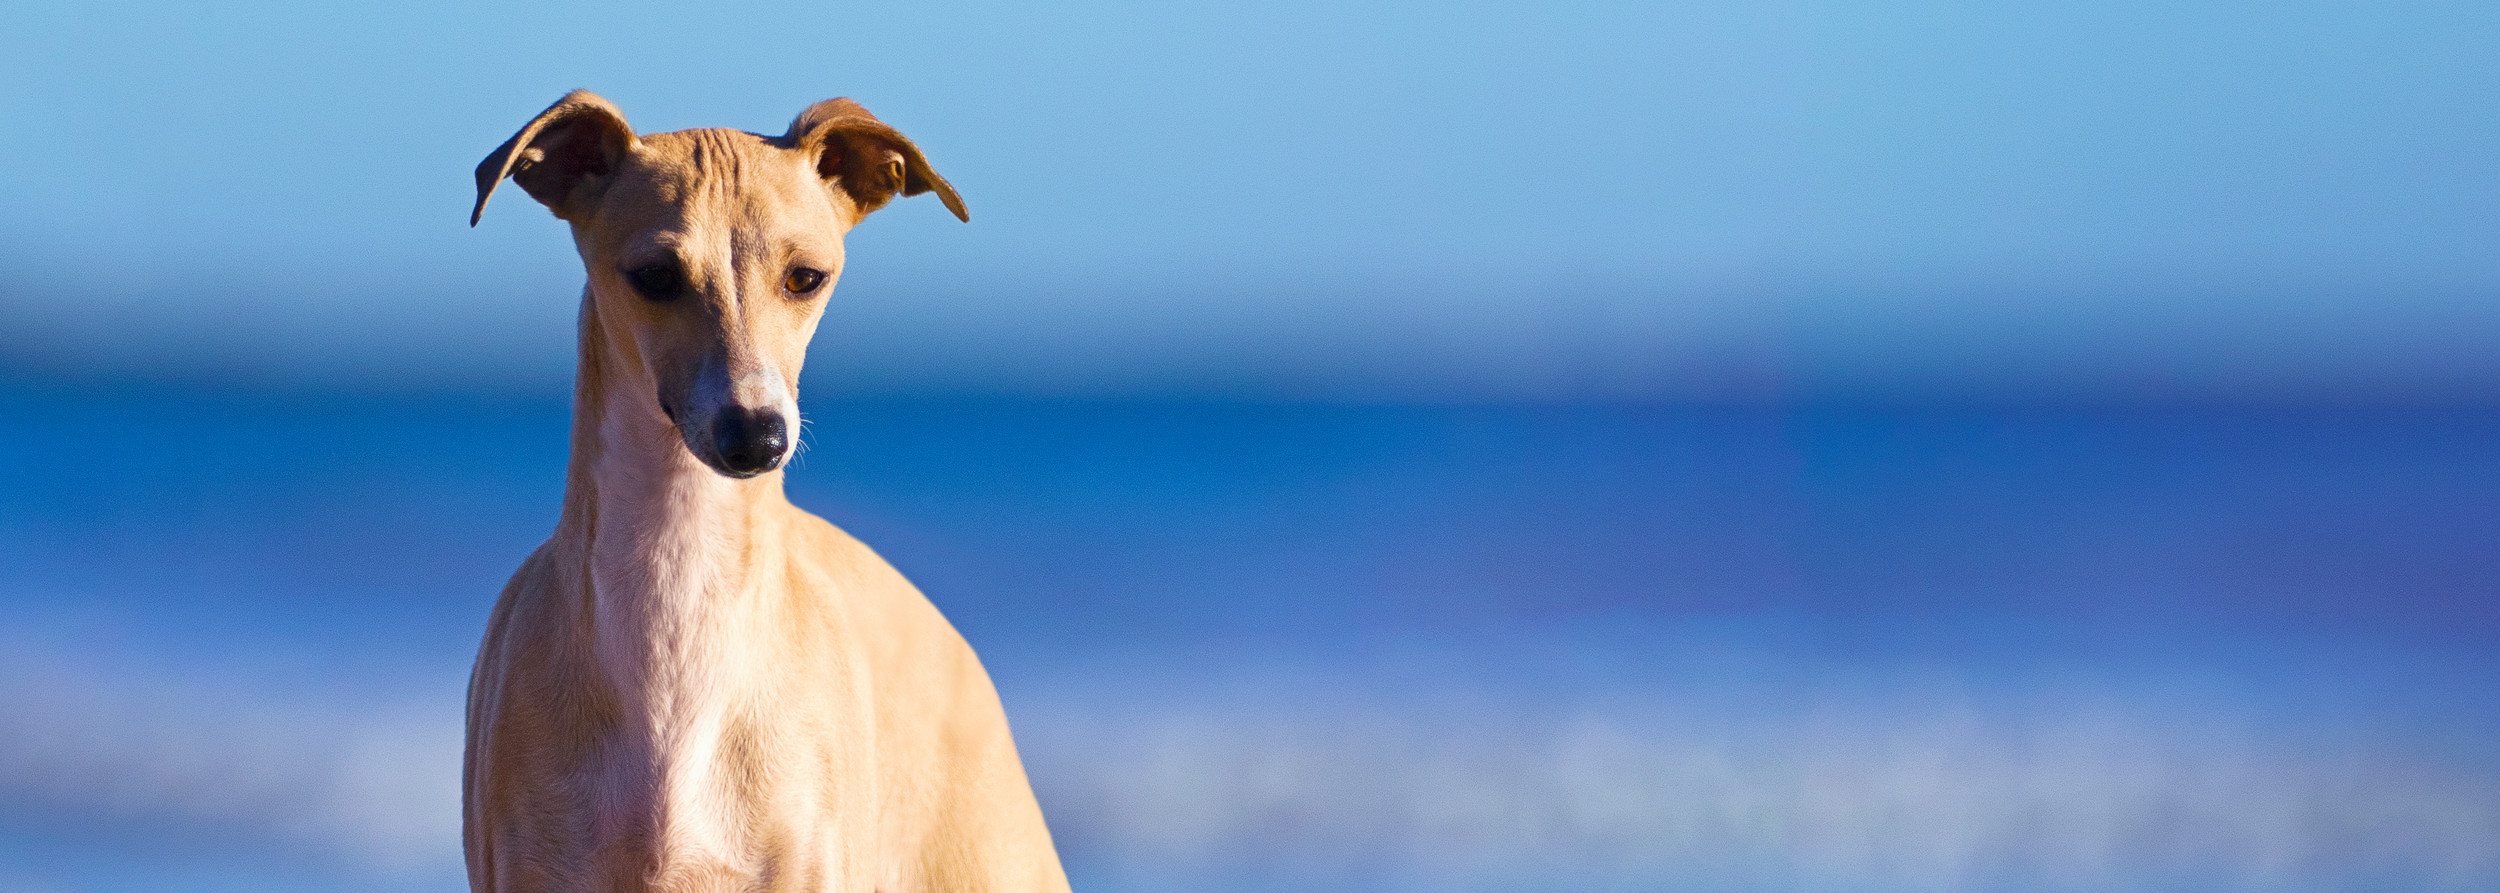 Skyefall Italian Greyhounds - Melbourne